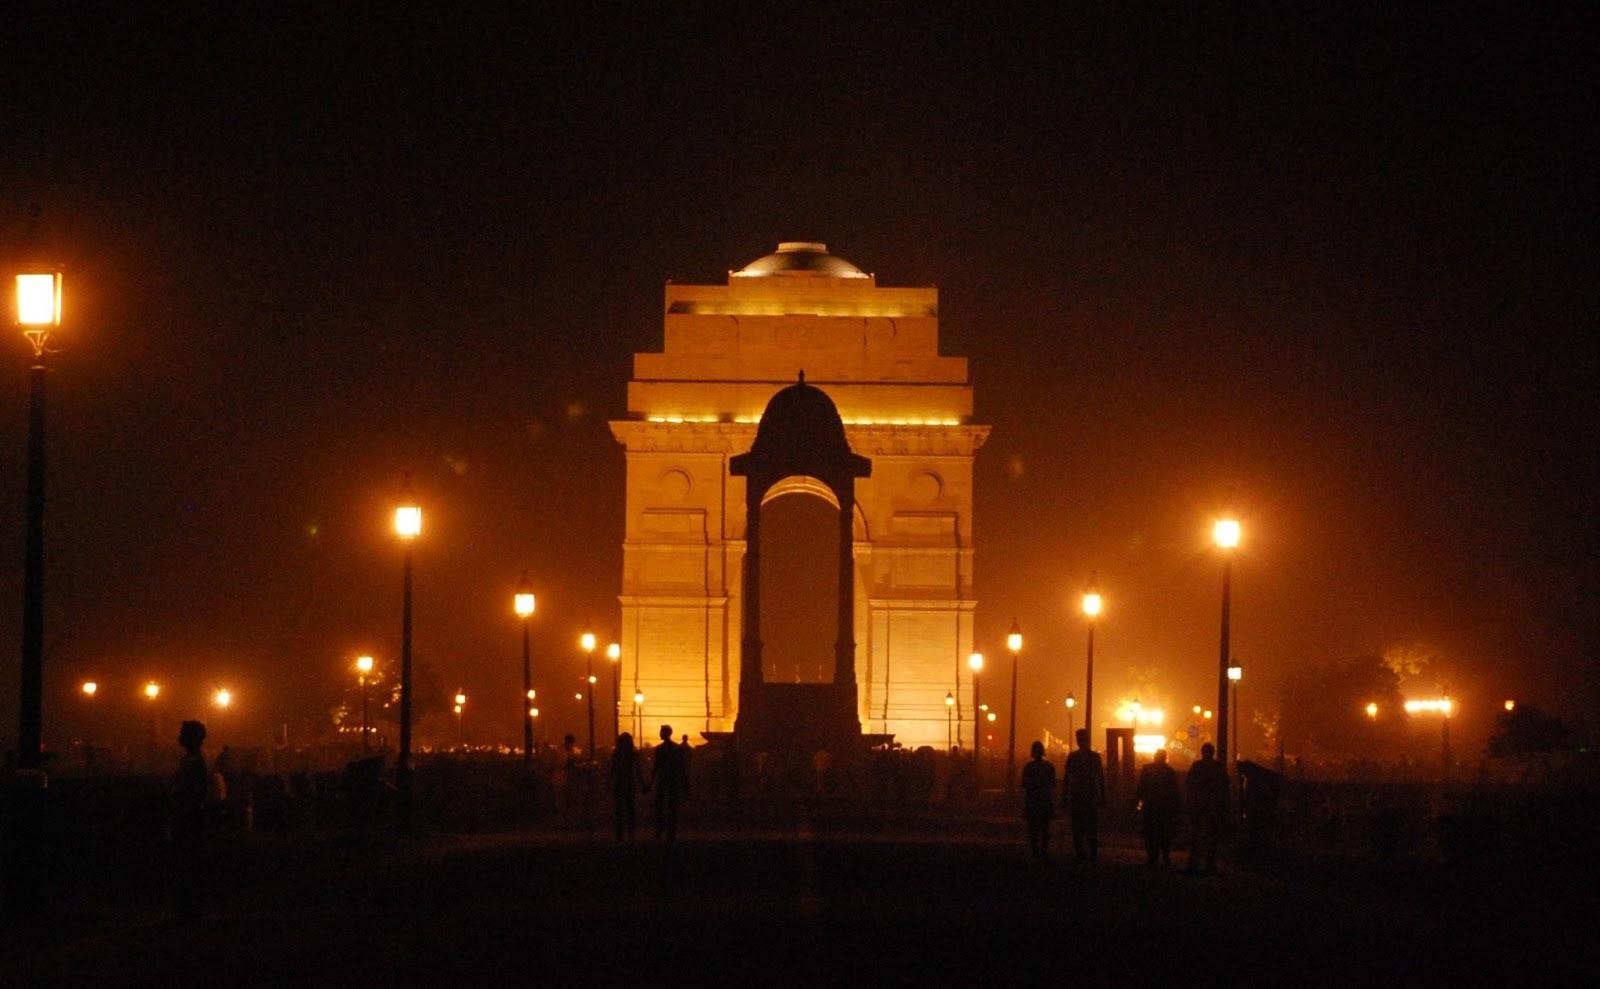 free download wallpaper hd : india gate delhi high resolution full